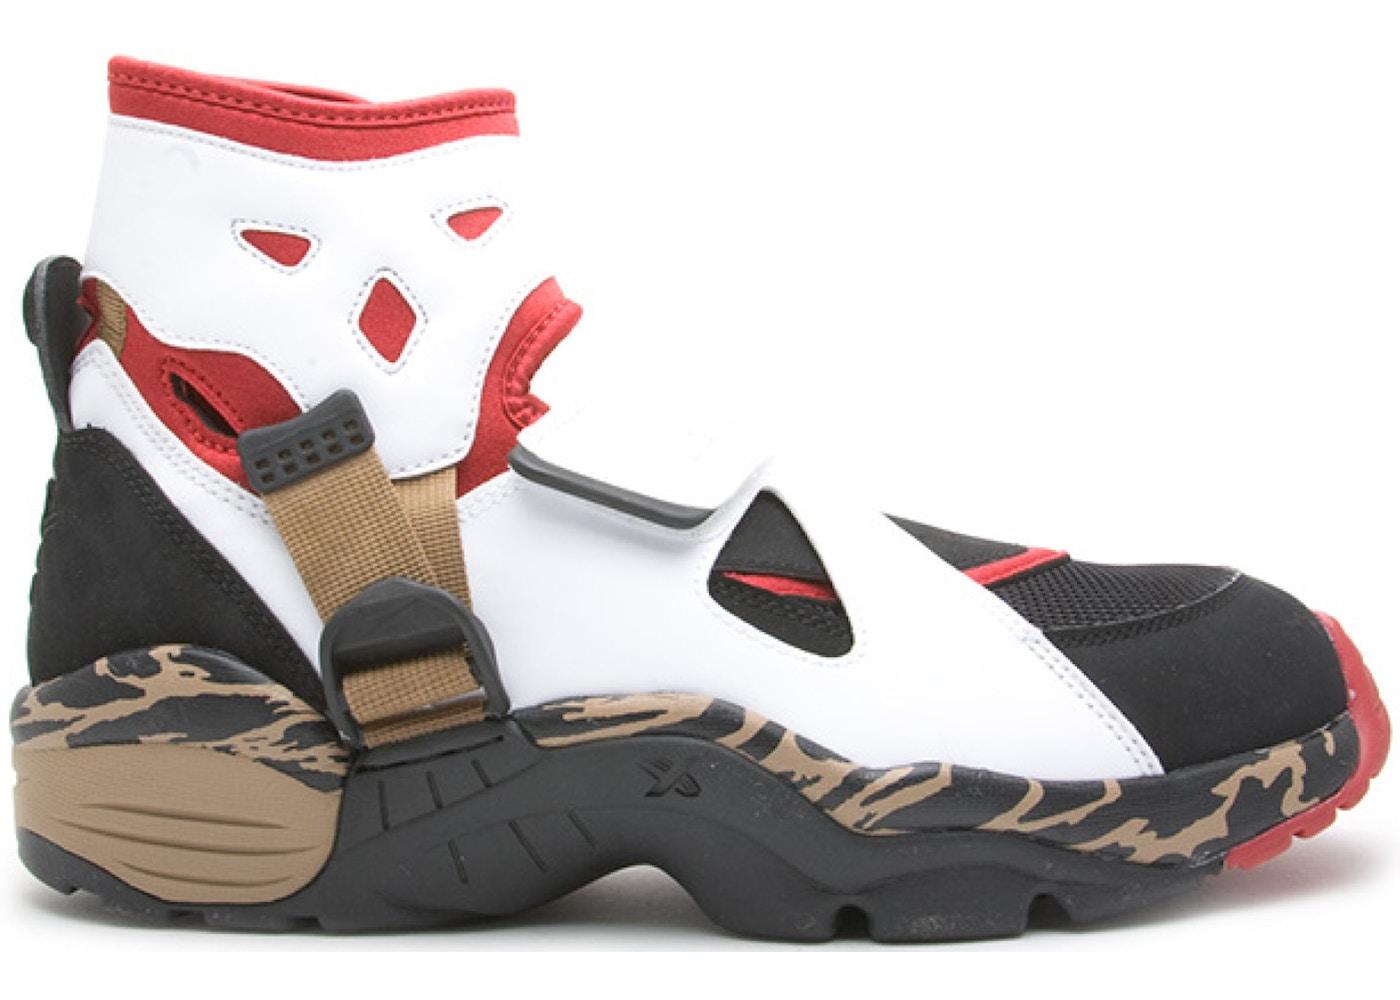 best sneakers 28212 8c801 Air Carnivore Red White Black - 390077-600